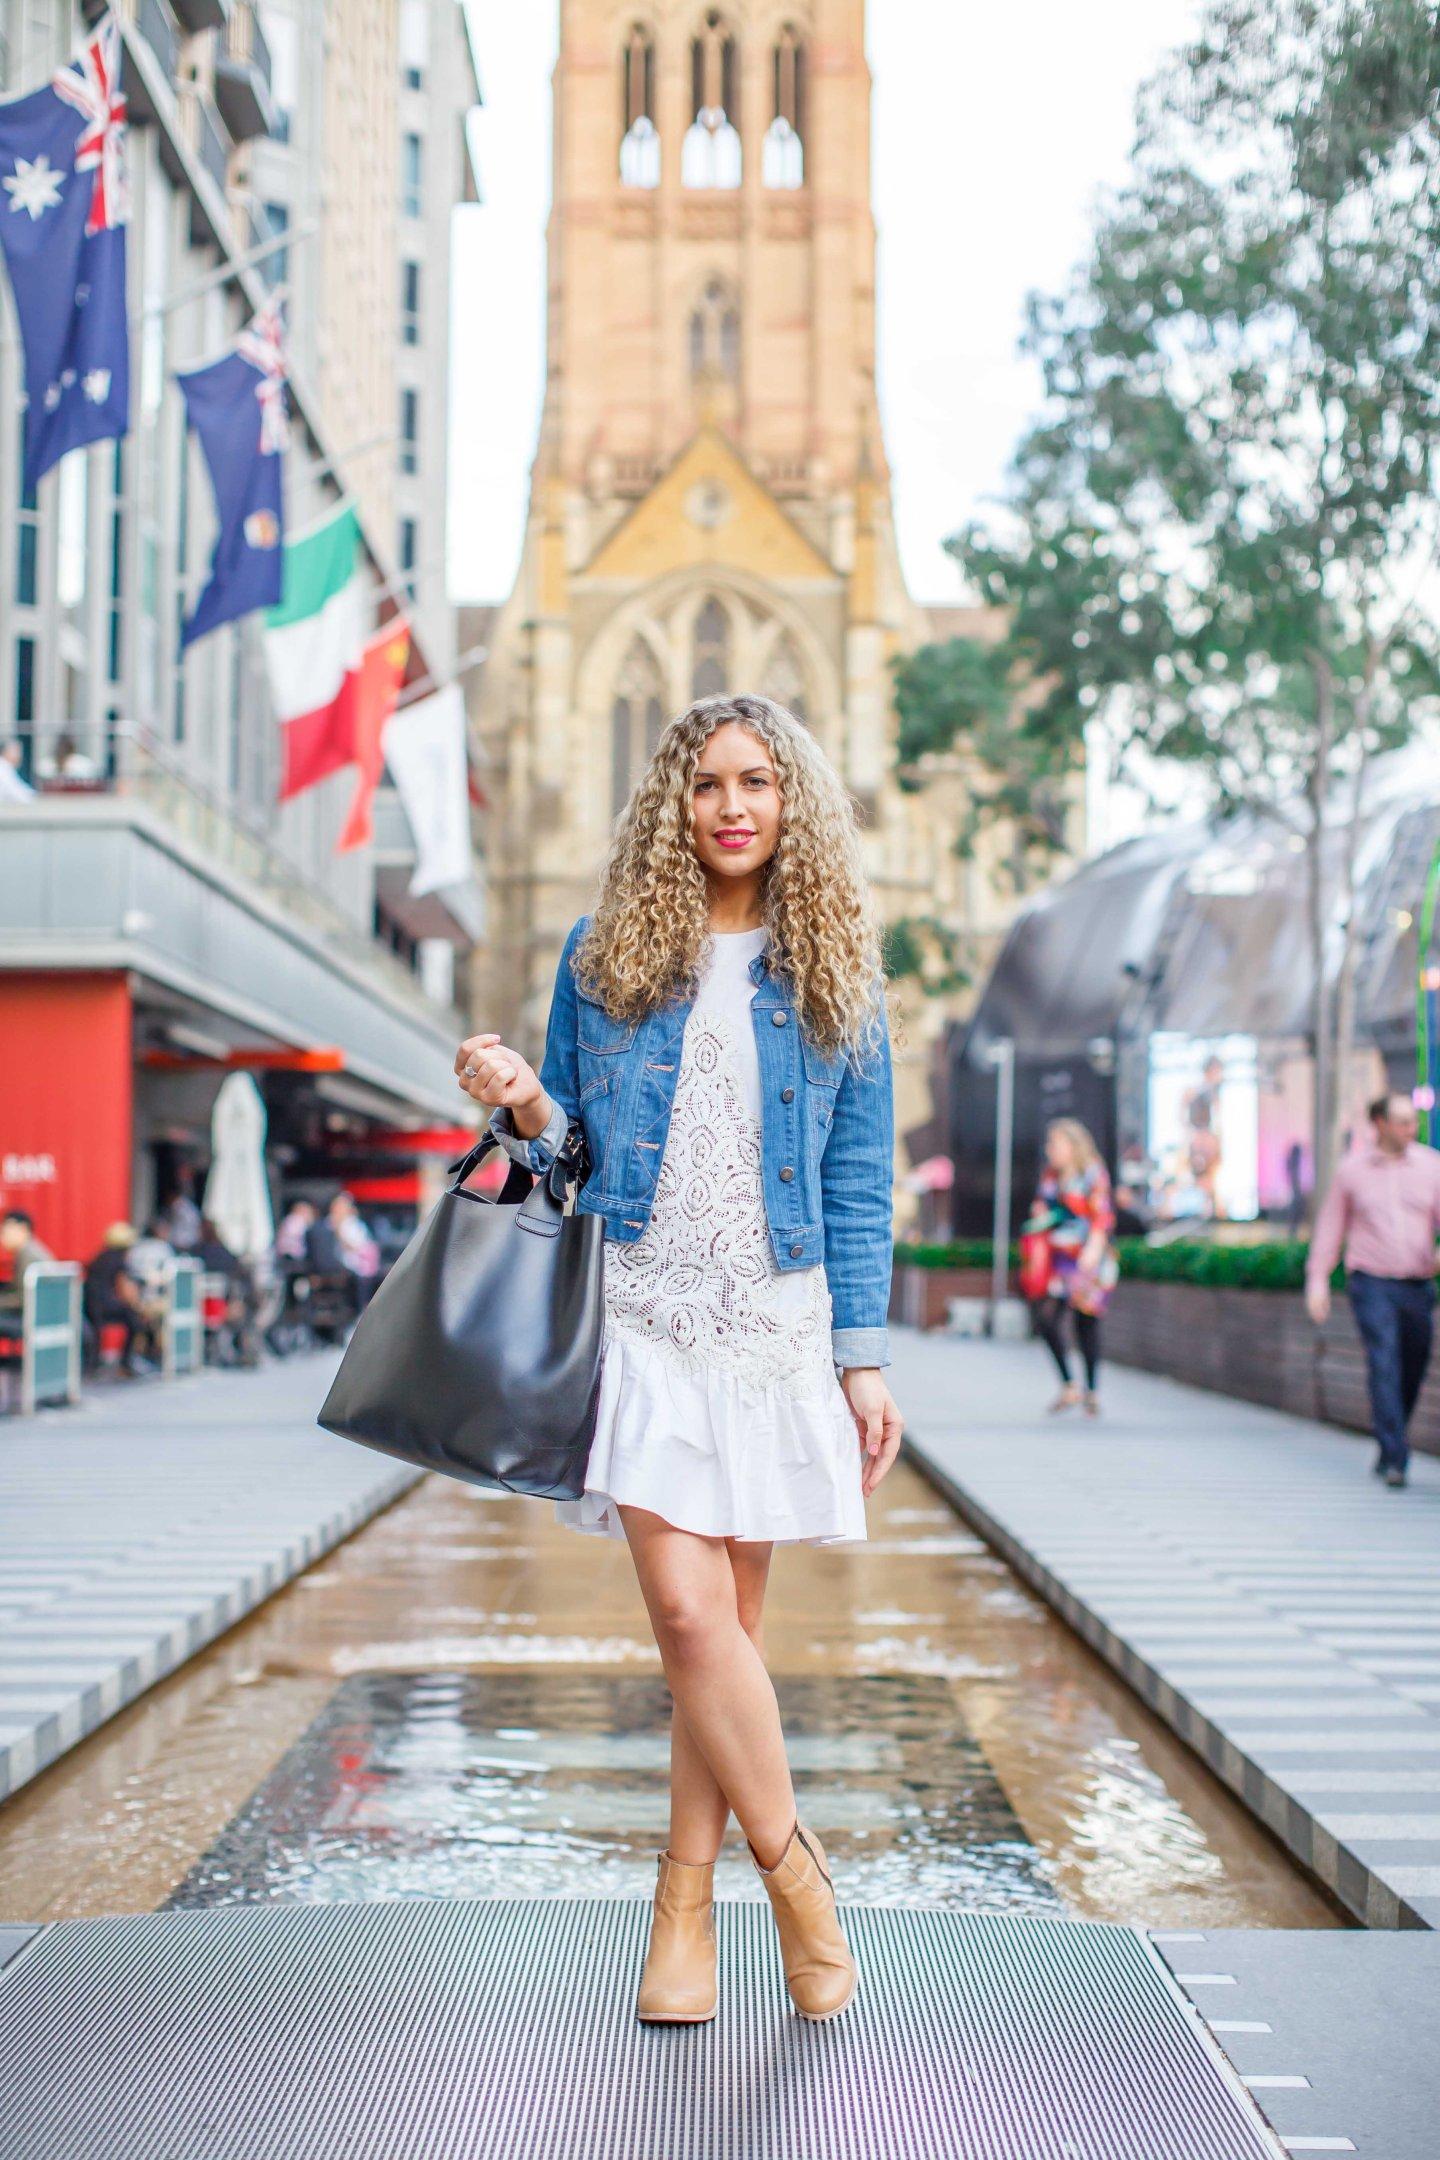 Drop waist, dress, denim, jacket, booties, ankle boots, womenswear, street style, your ensemble, yourensemble, yourensemble.com